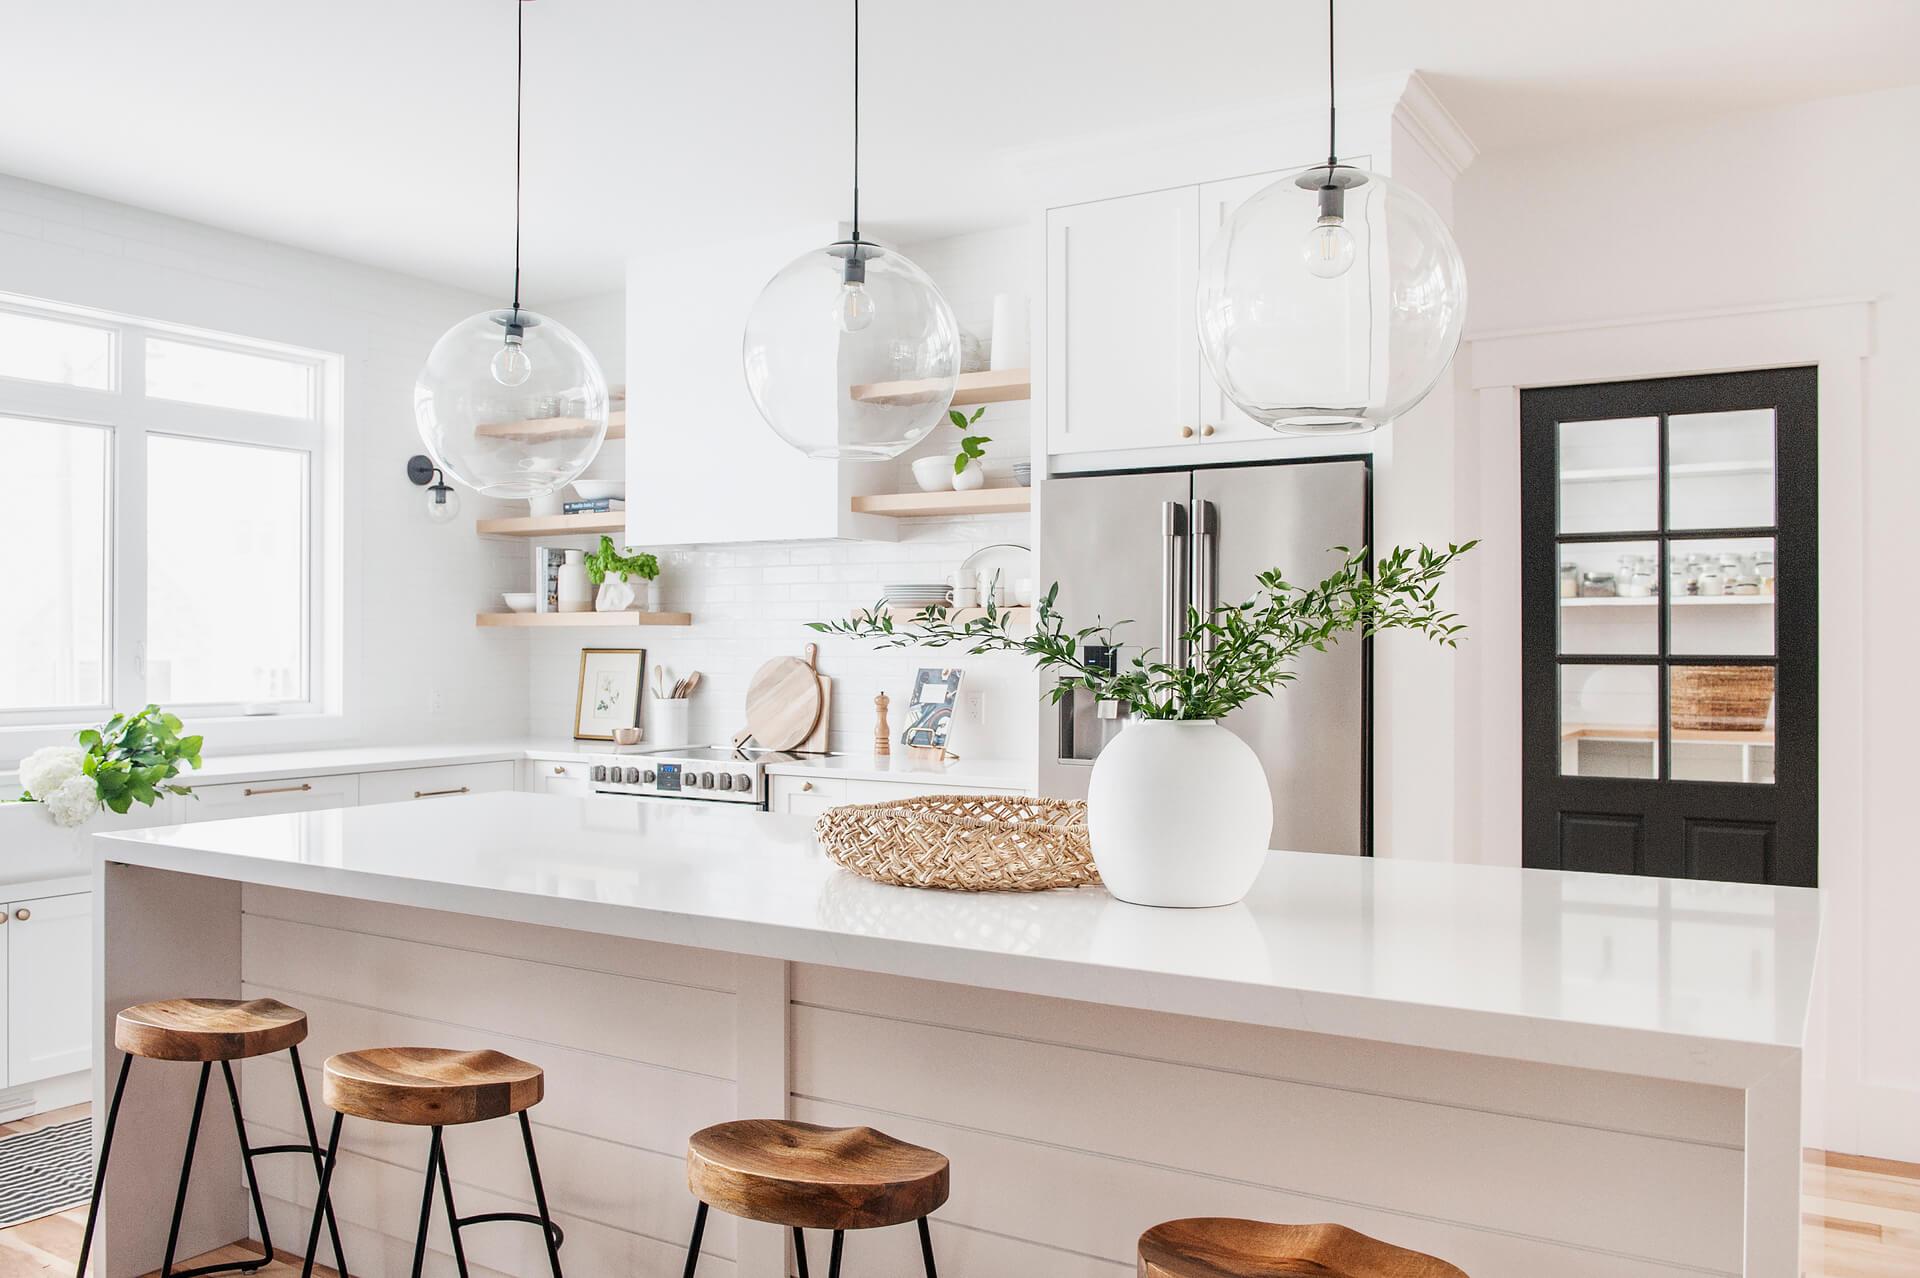 AKB Design cuisine blanche armoire noire poignee laiton comptoir quartz garde manger 18